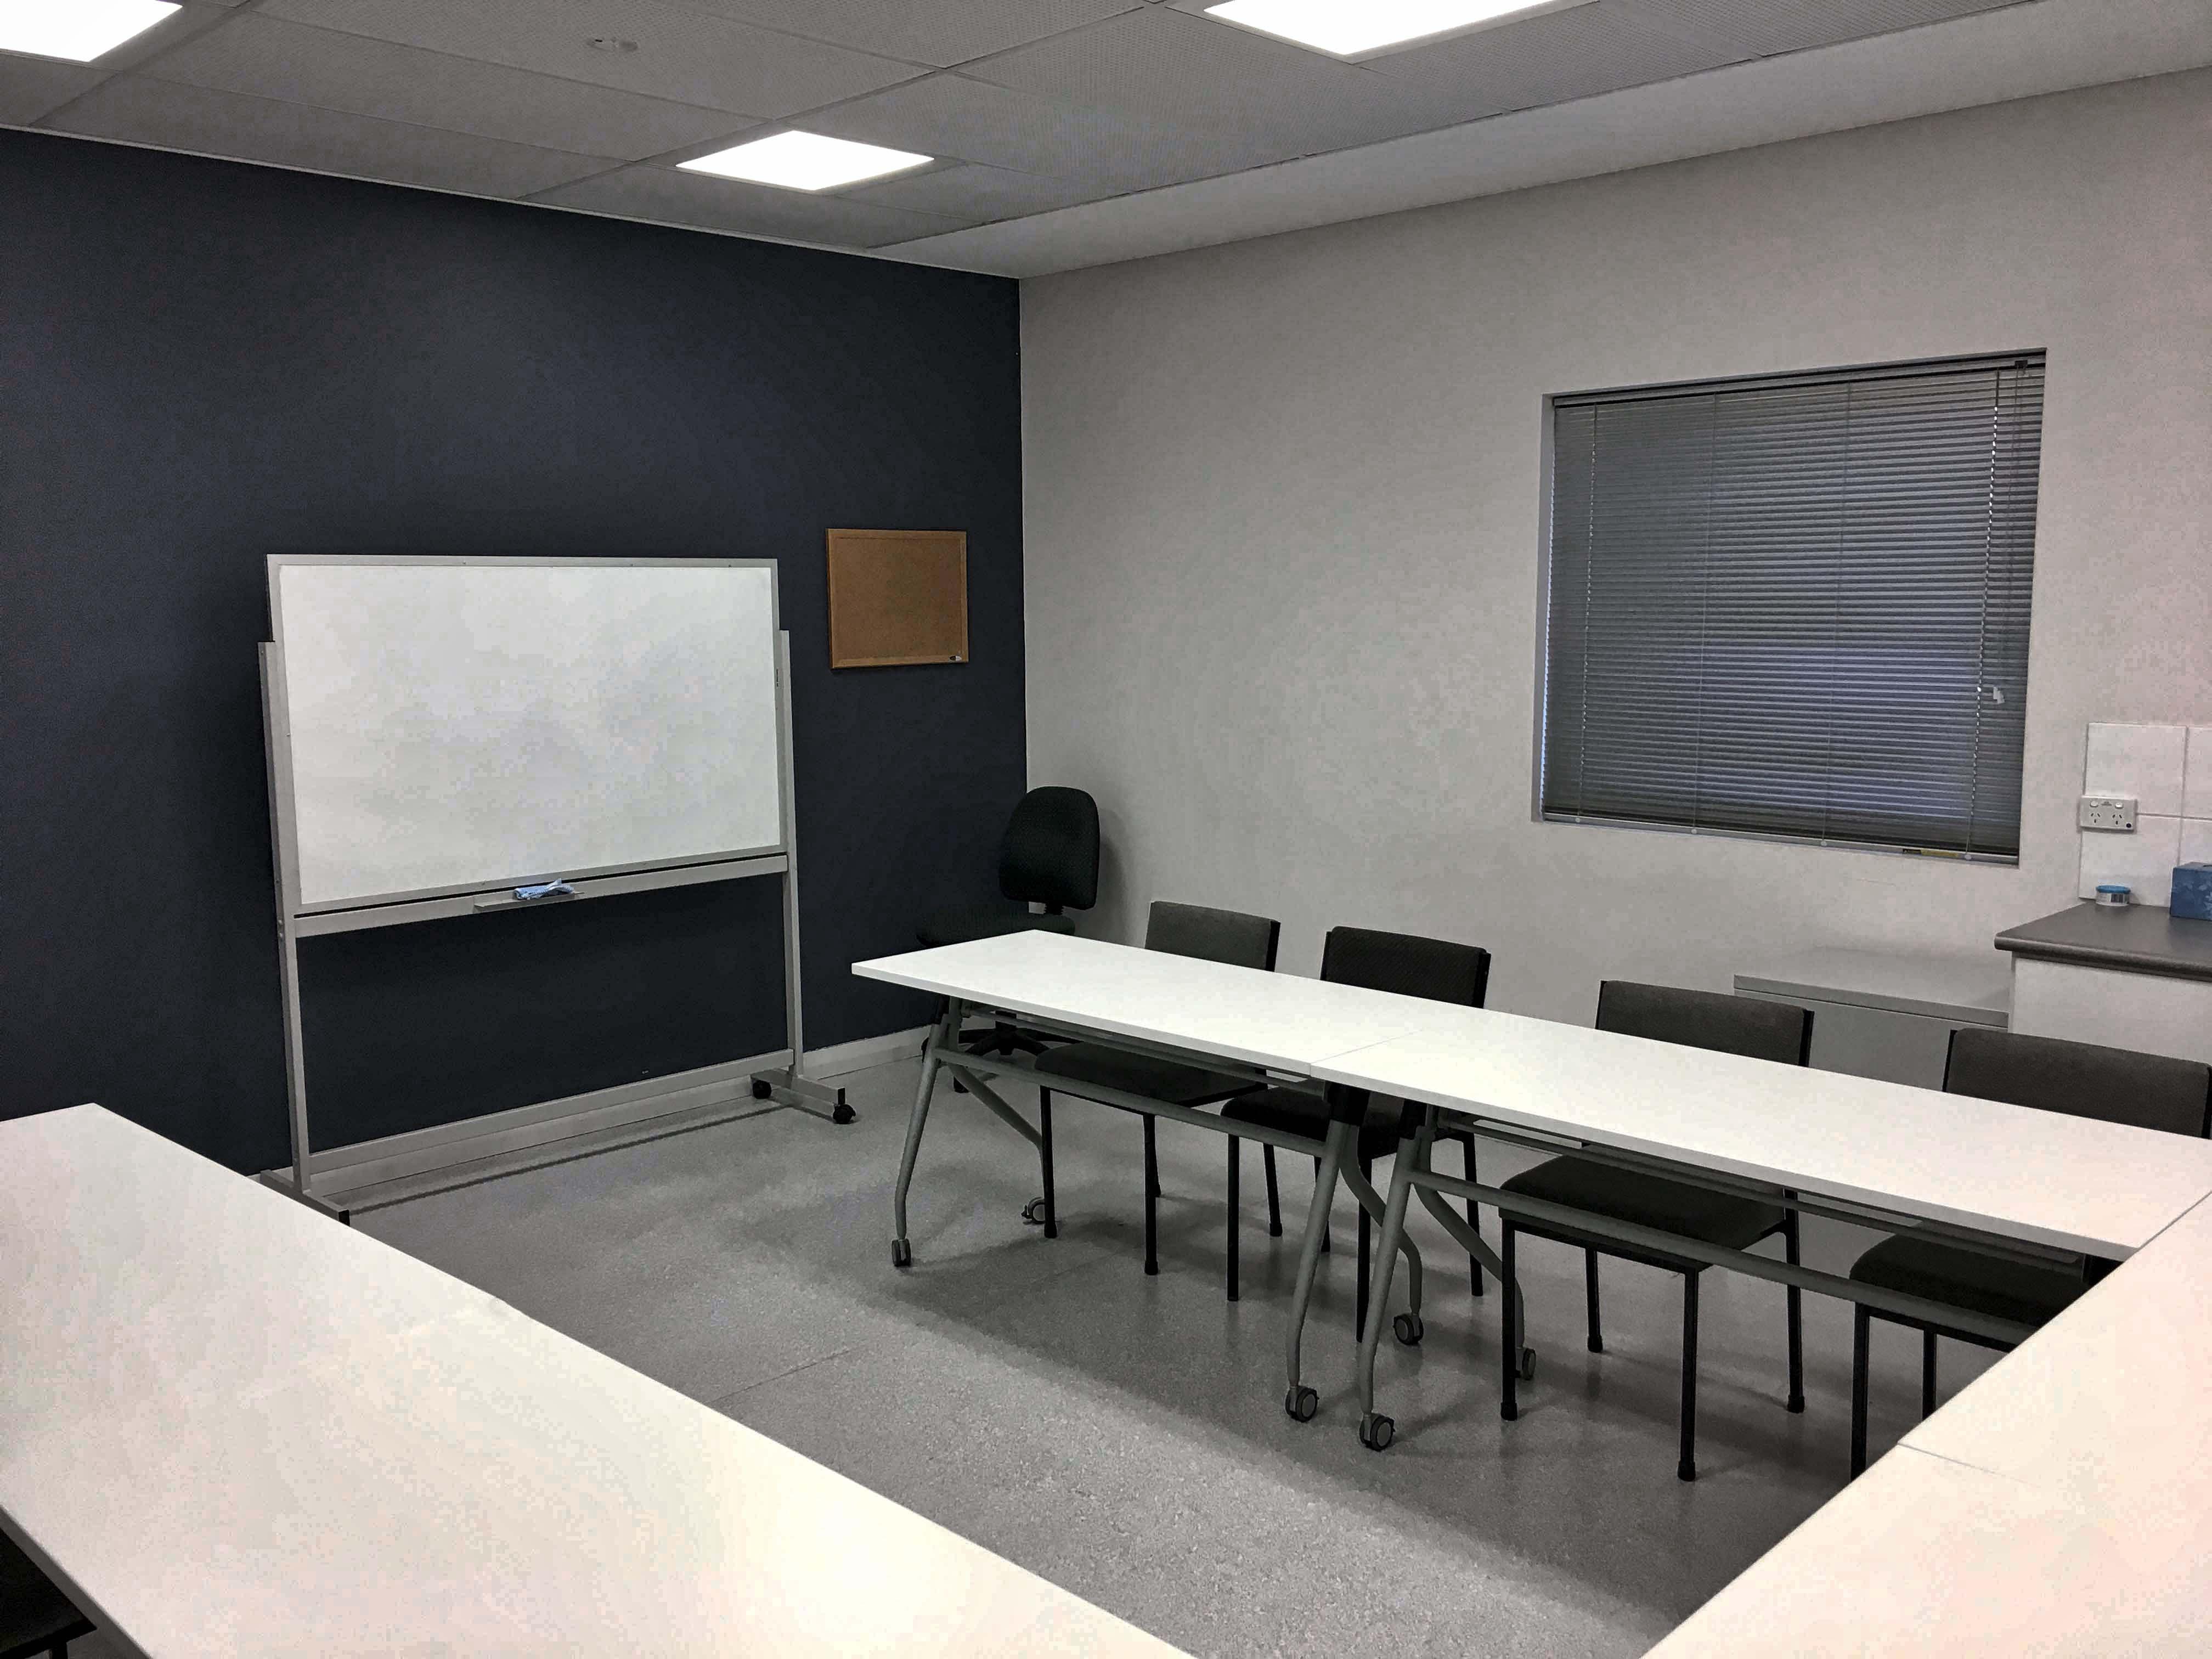 Consult 7 - Seats 14